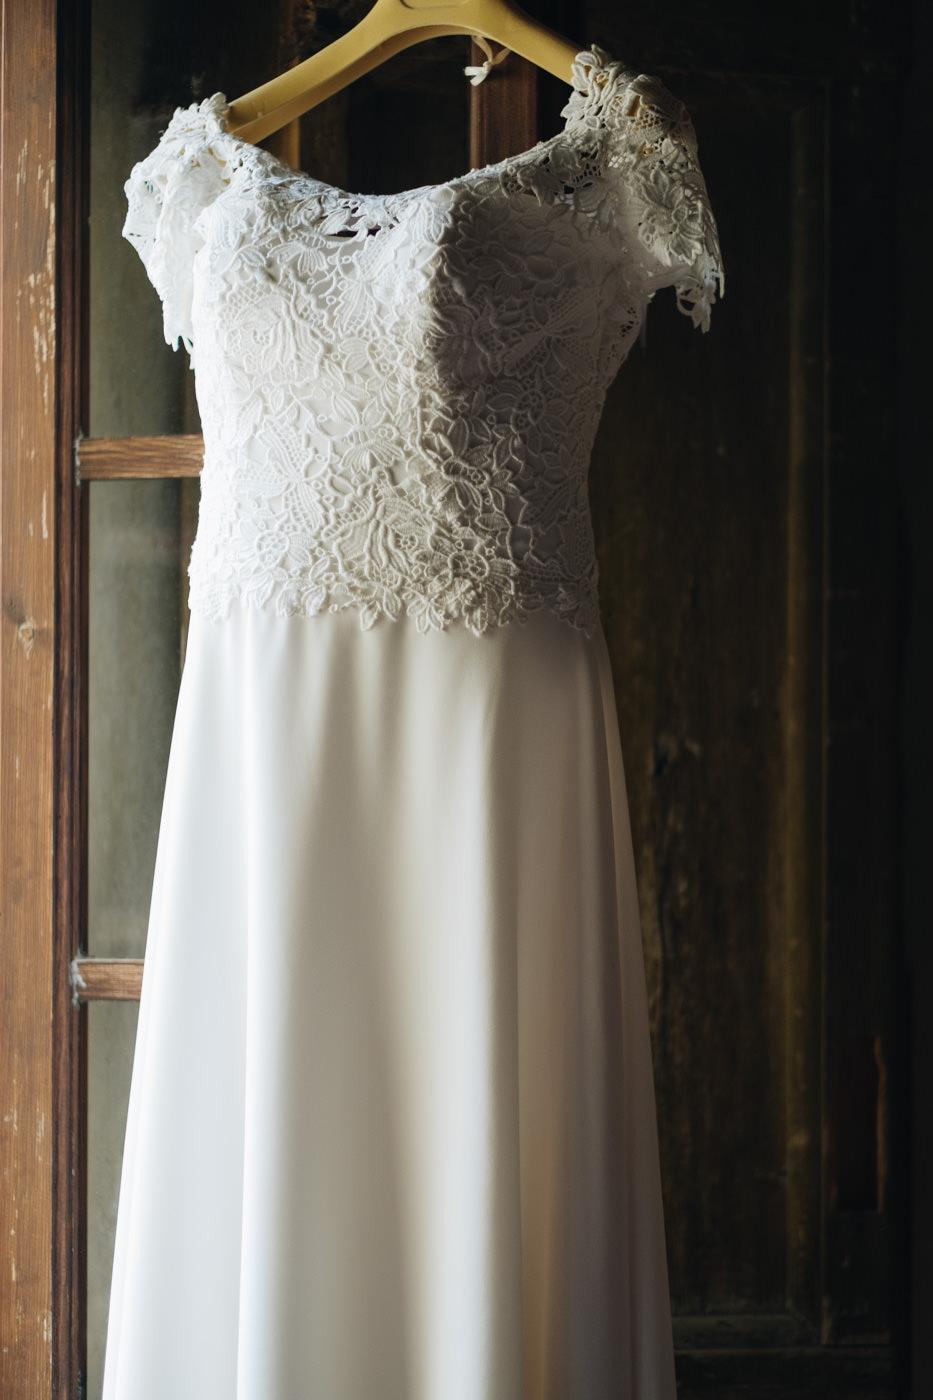 matrimoni_all_italiana_fotografo_matrimonio_toscana-16.jpg